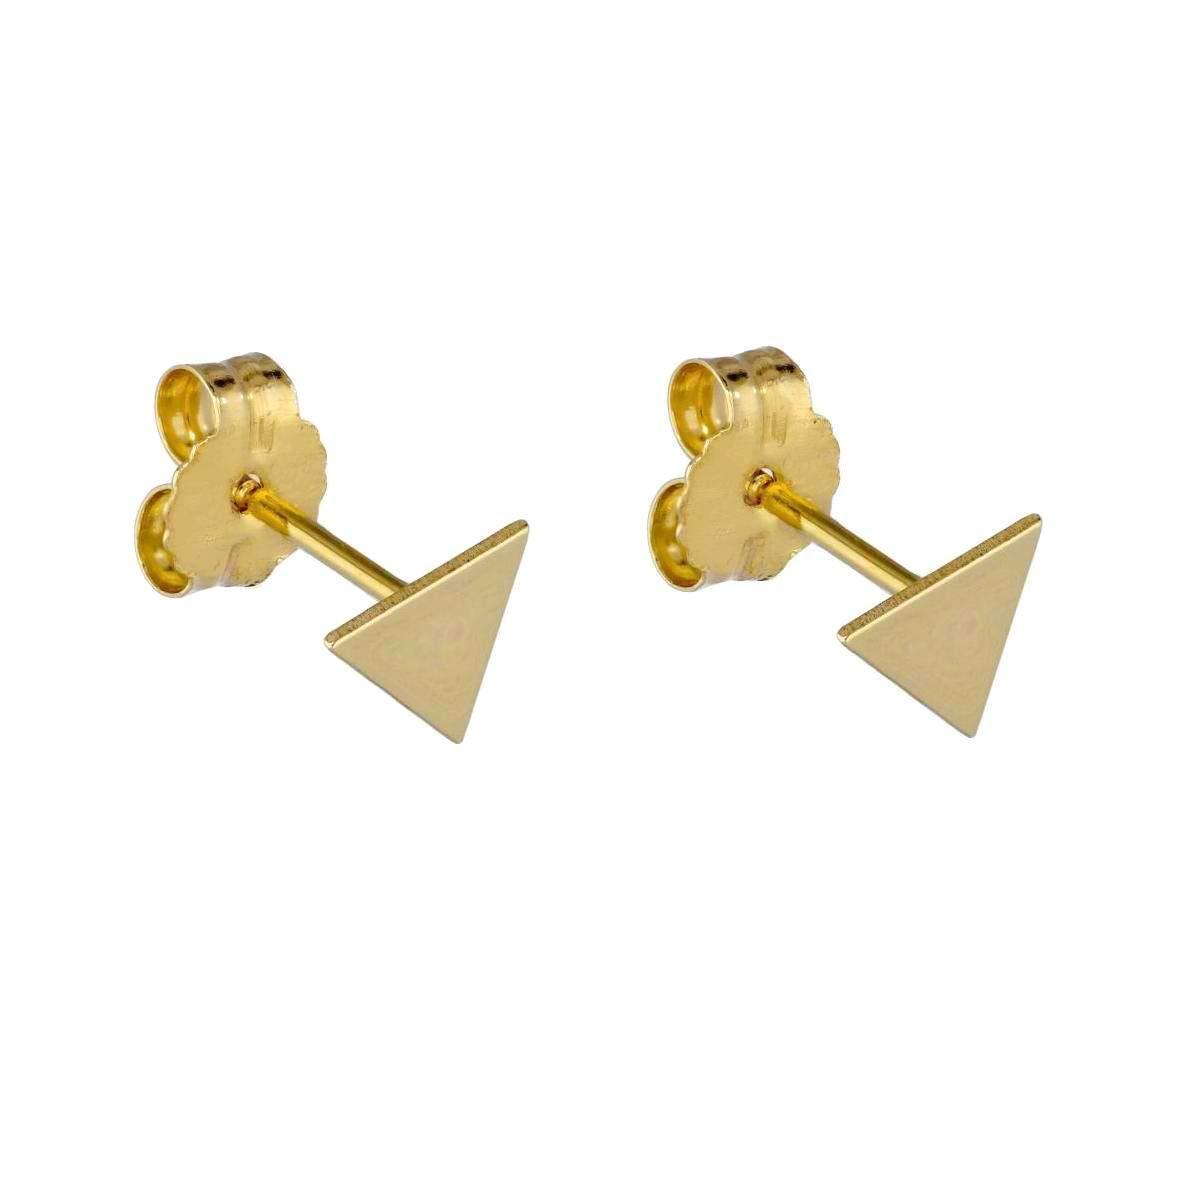 Geometric Studs Triangle Stud Earrings Polymer Clay Earrings Polymer Clay Stud Large Triangle Stud Geometric Stud Earrings